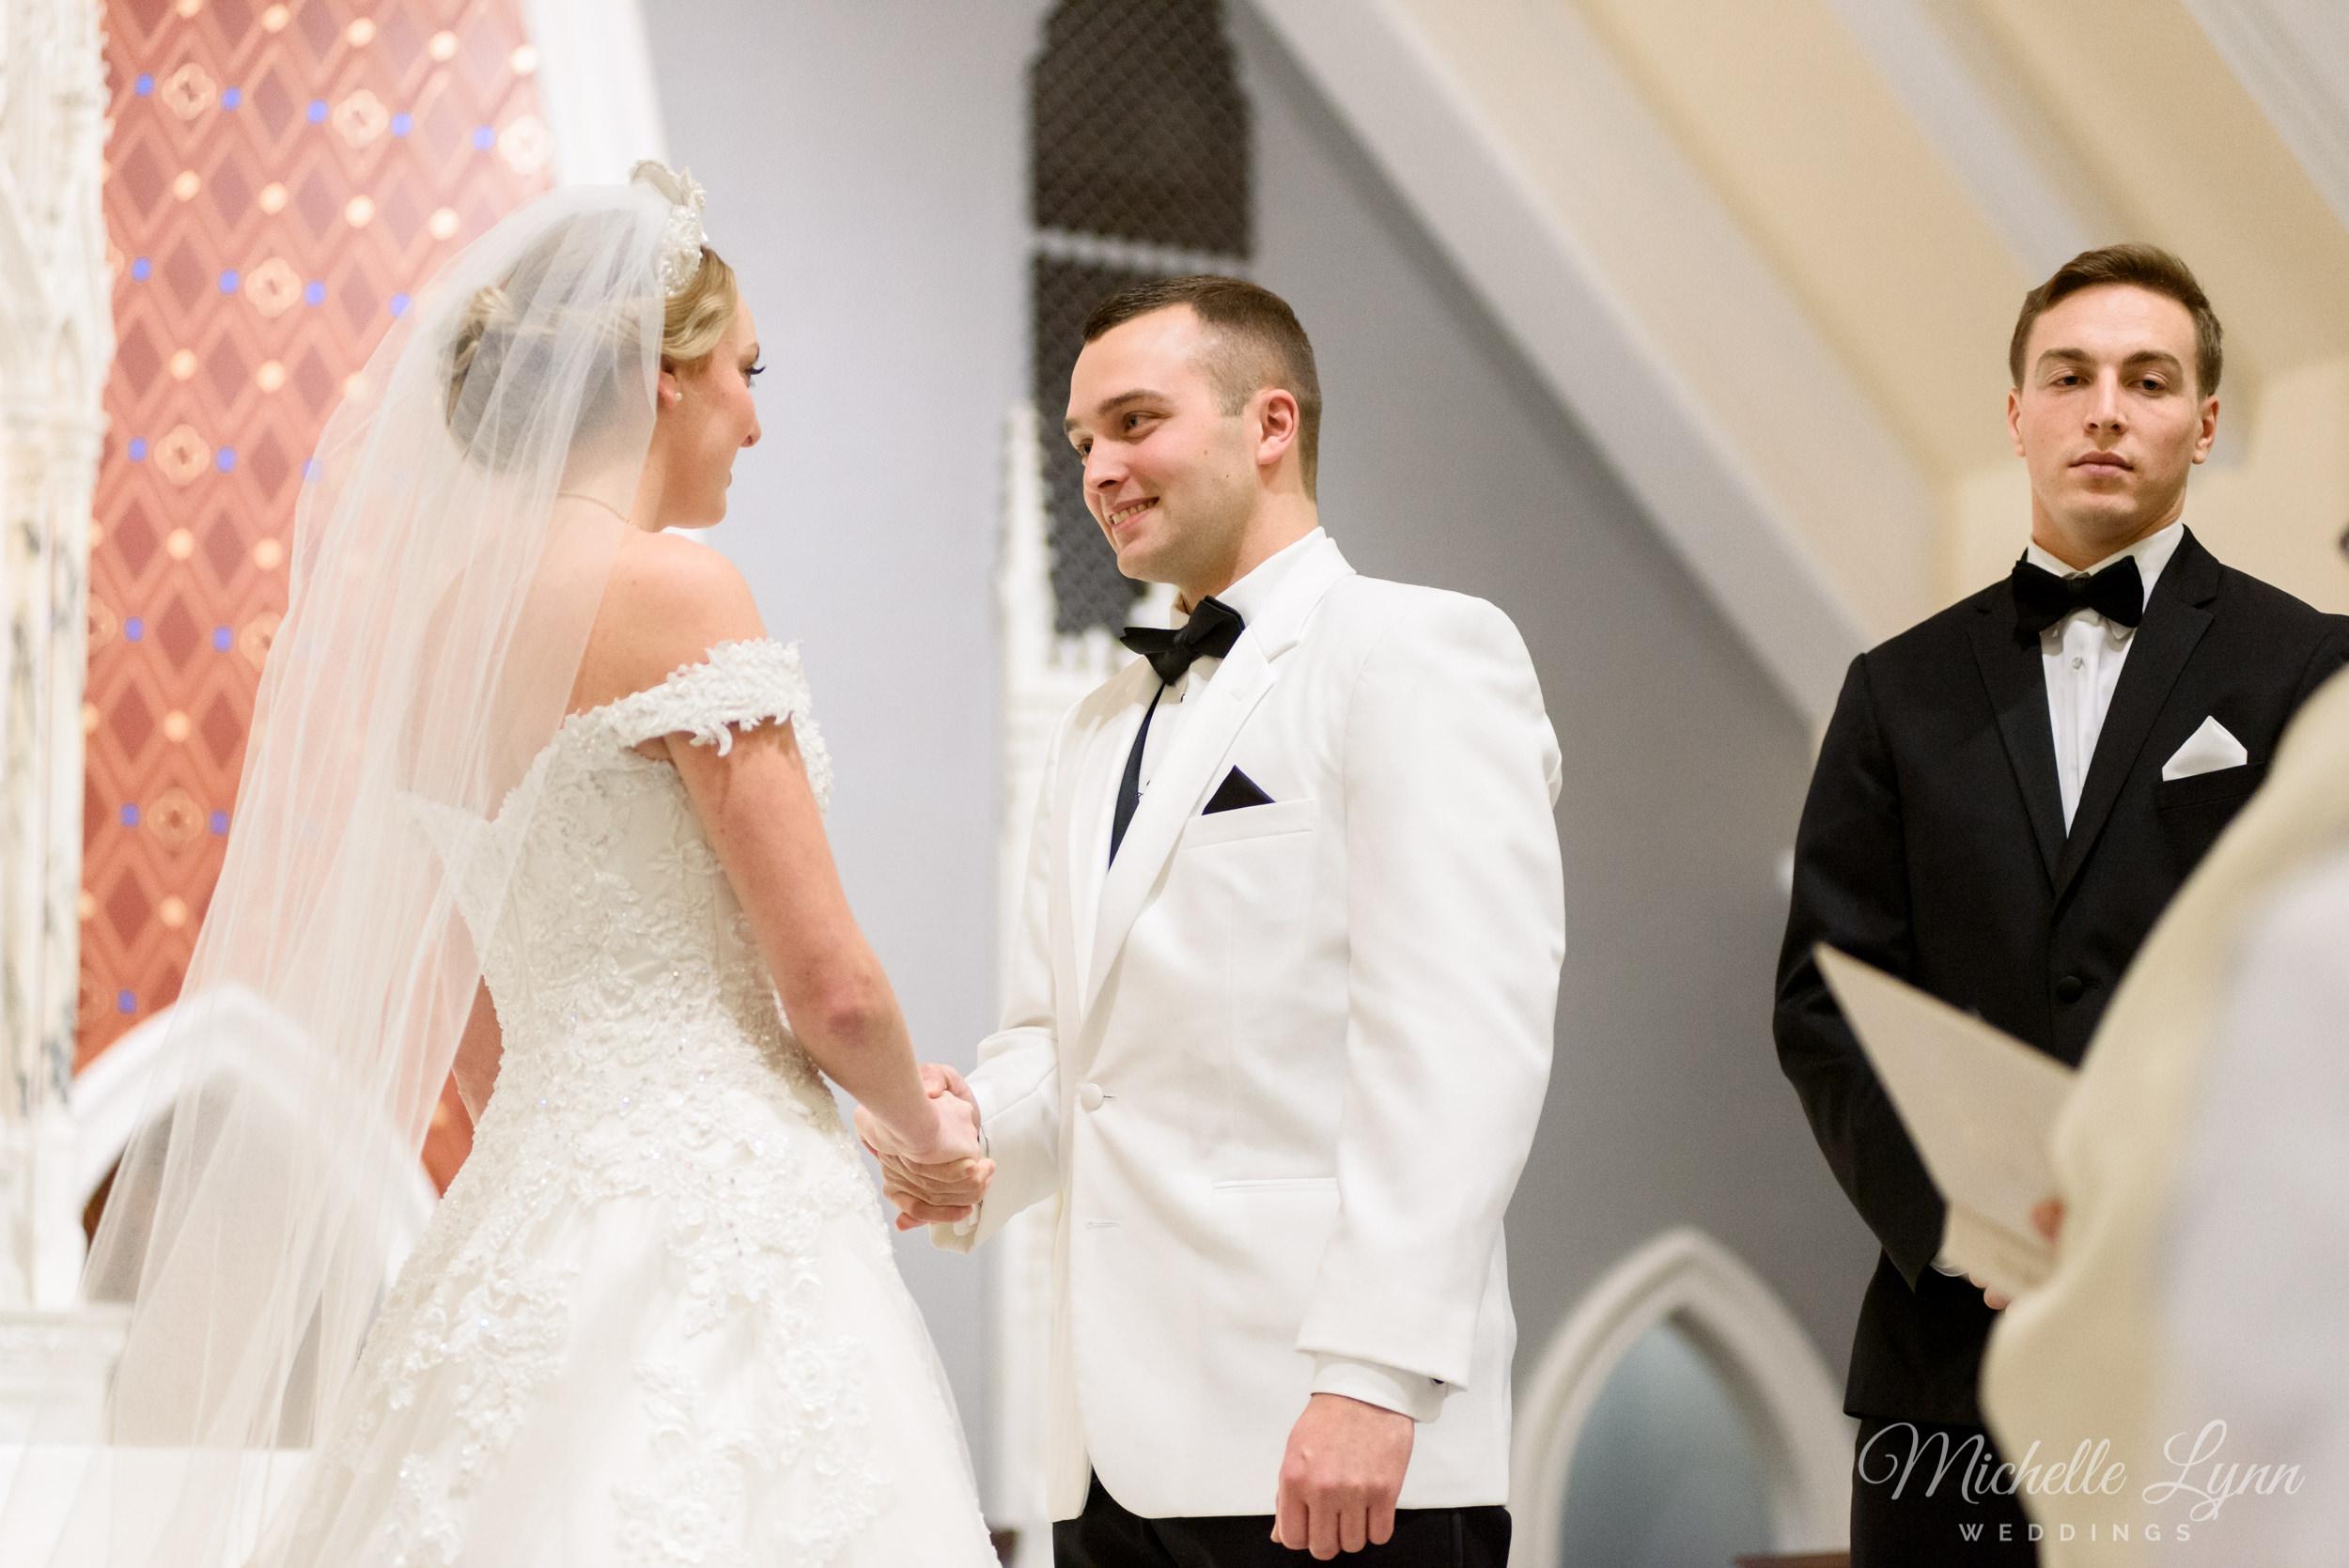 william-penn-inn-wedding-photography-mlw-57.jpg